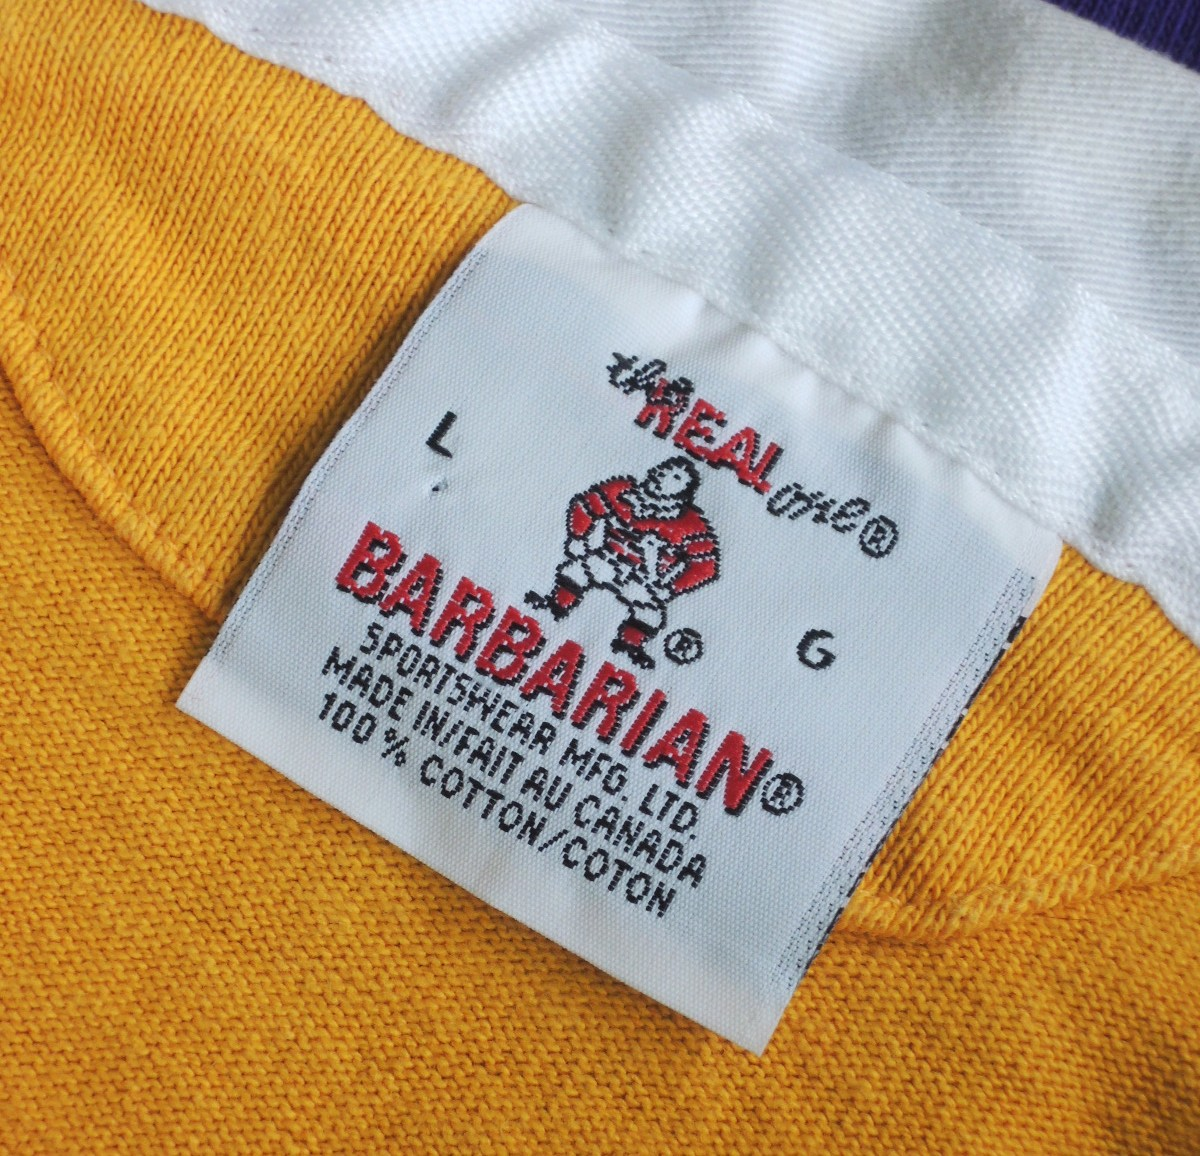 barbarian02_02.JPG